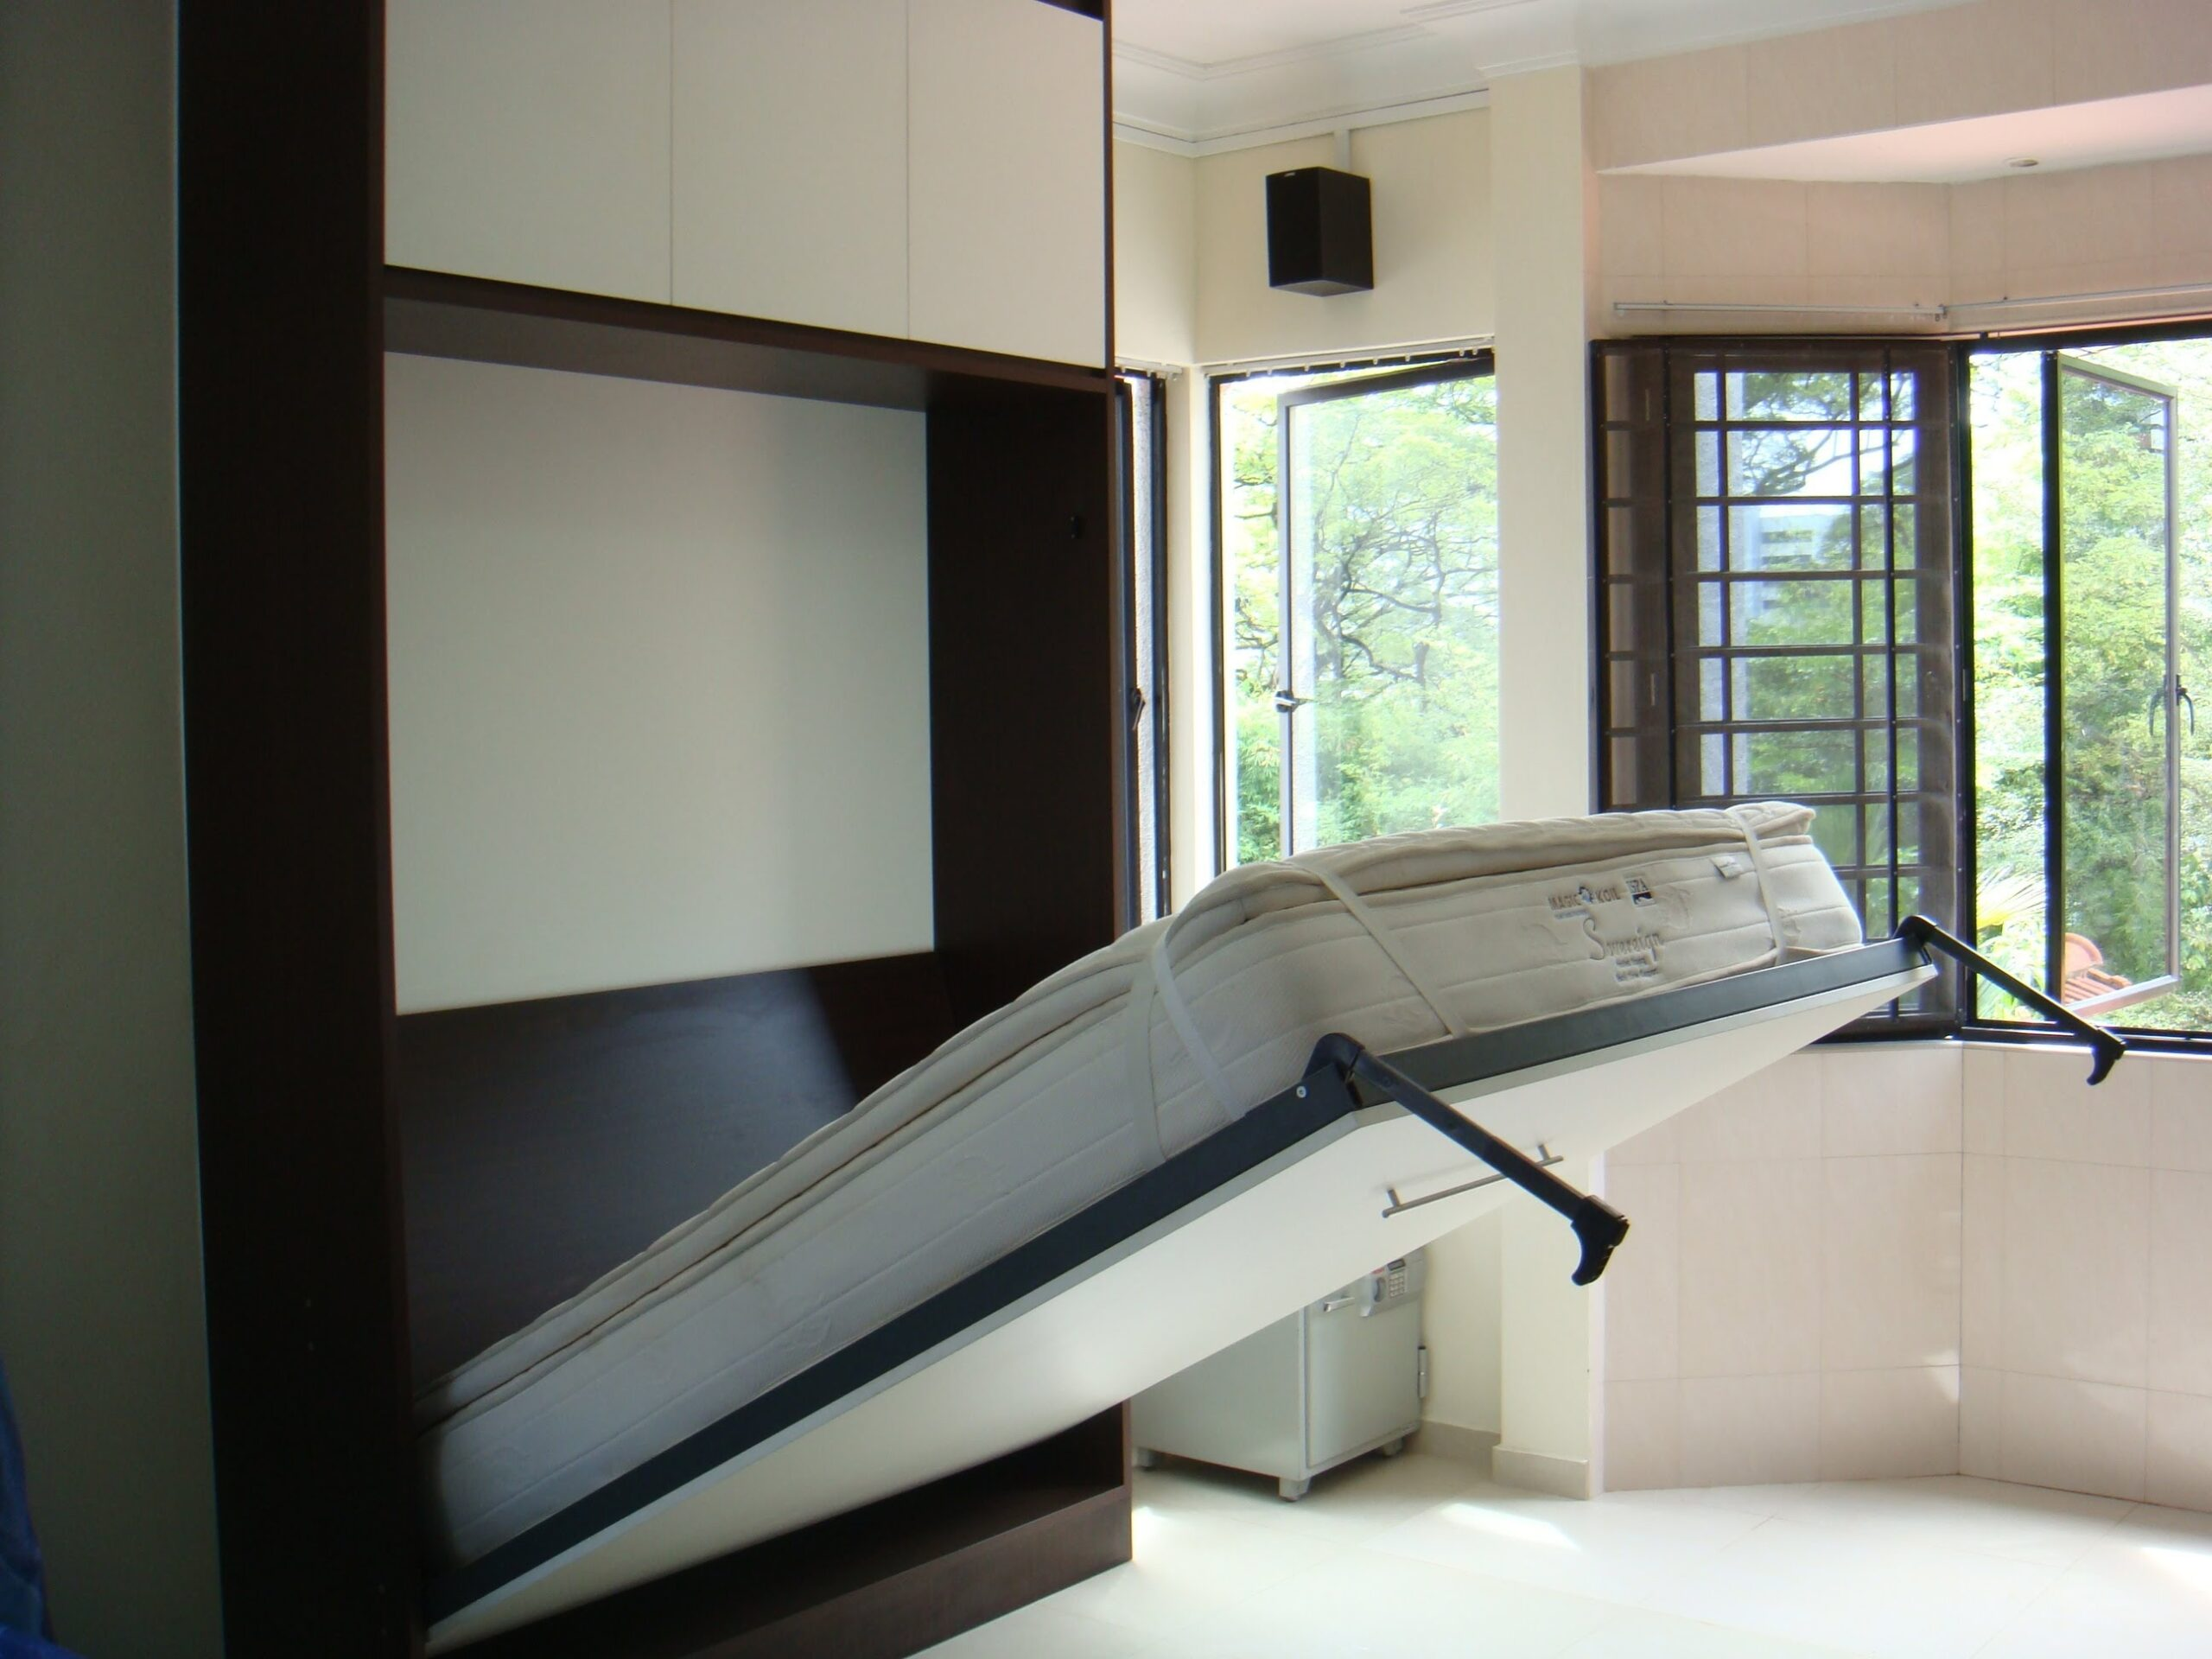 механизм шкафа-кровати